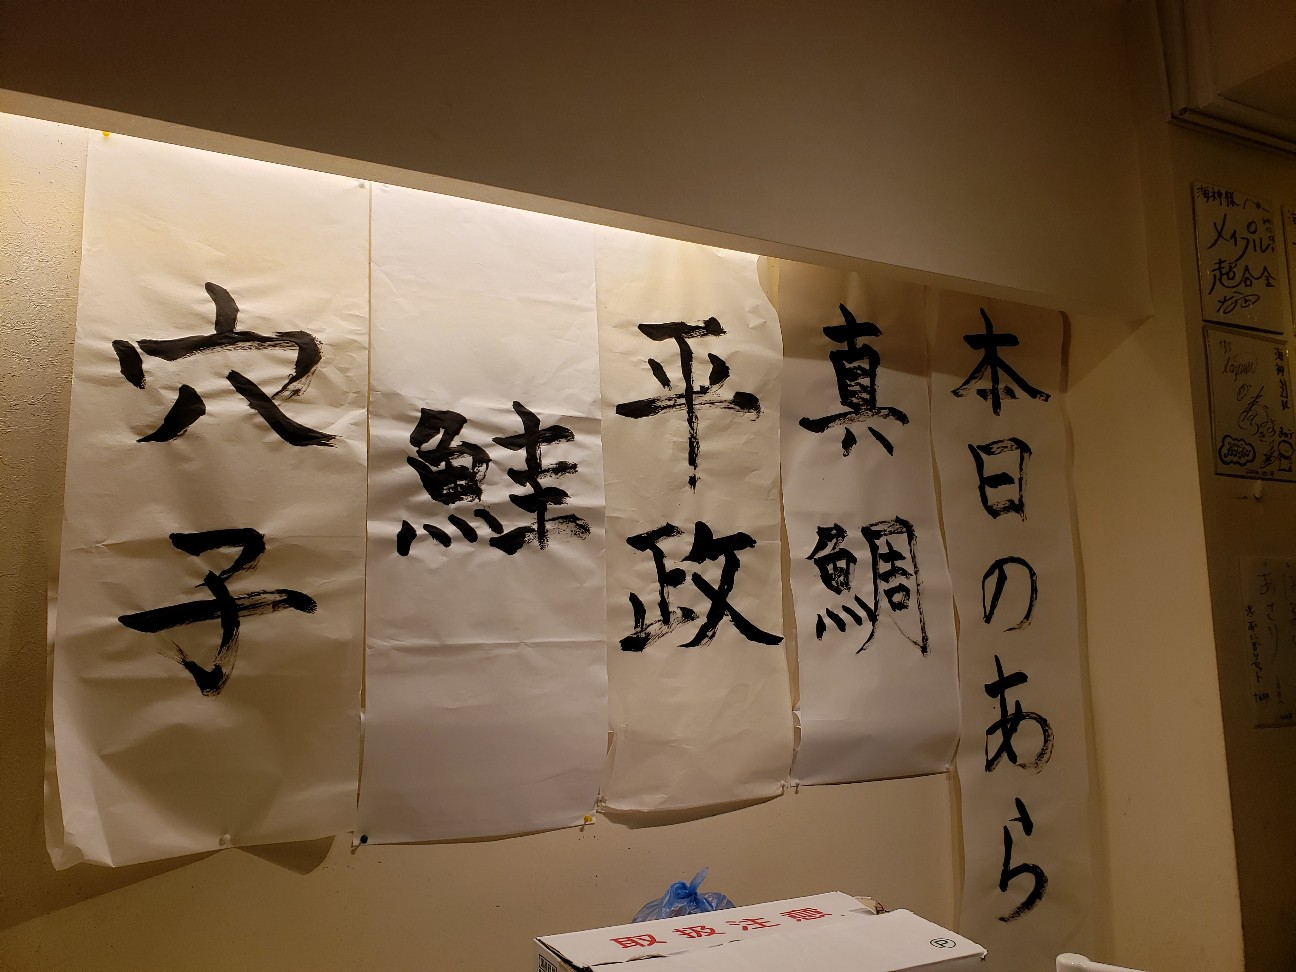 f:id:tt-suzukiit:20200720213124j:image